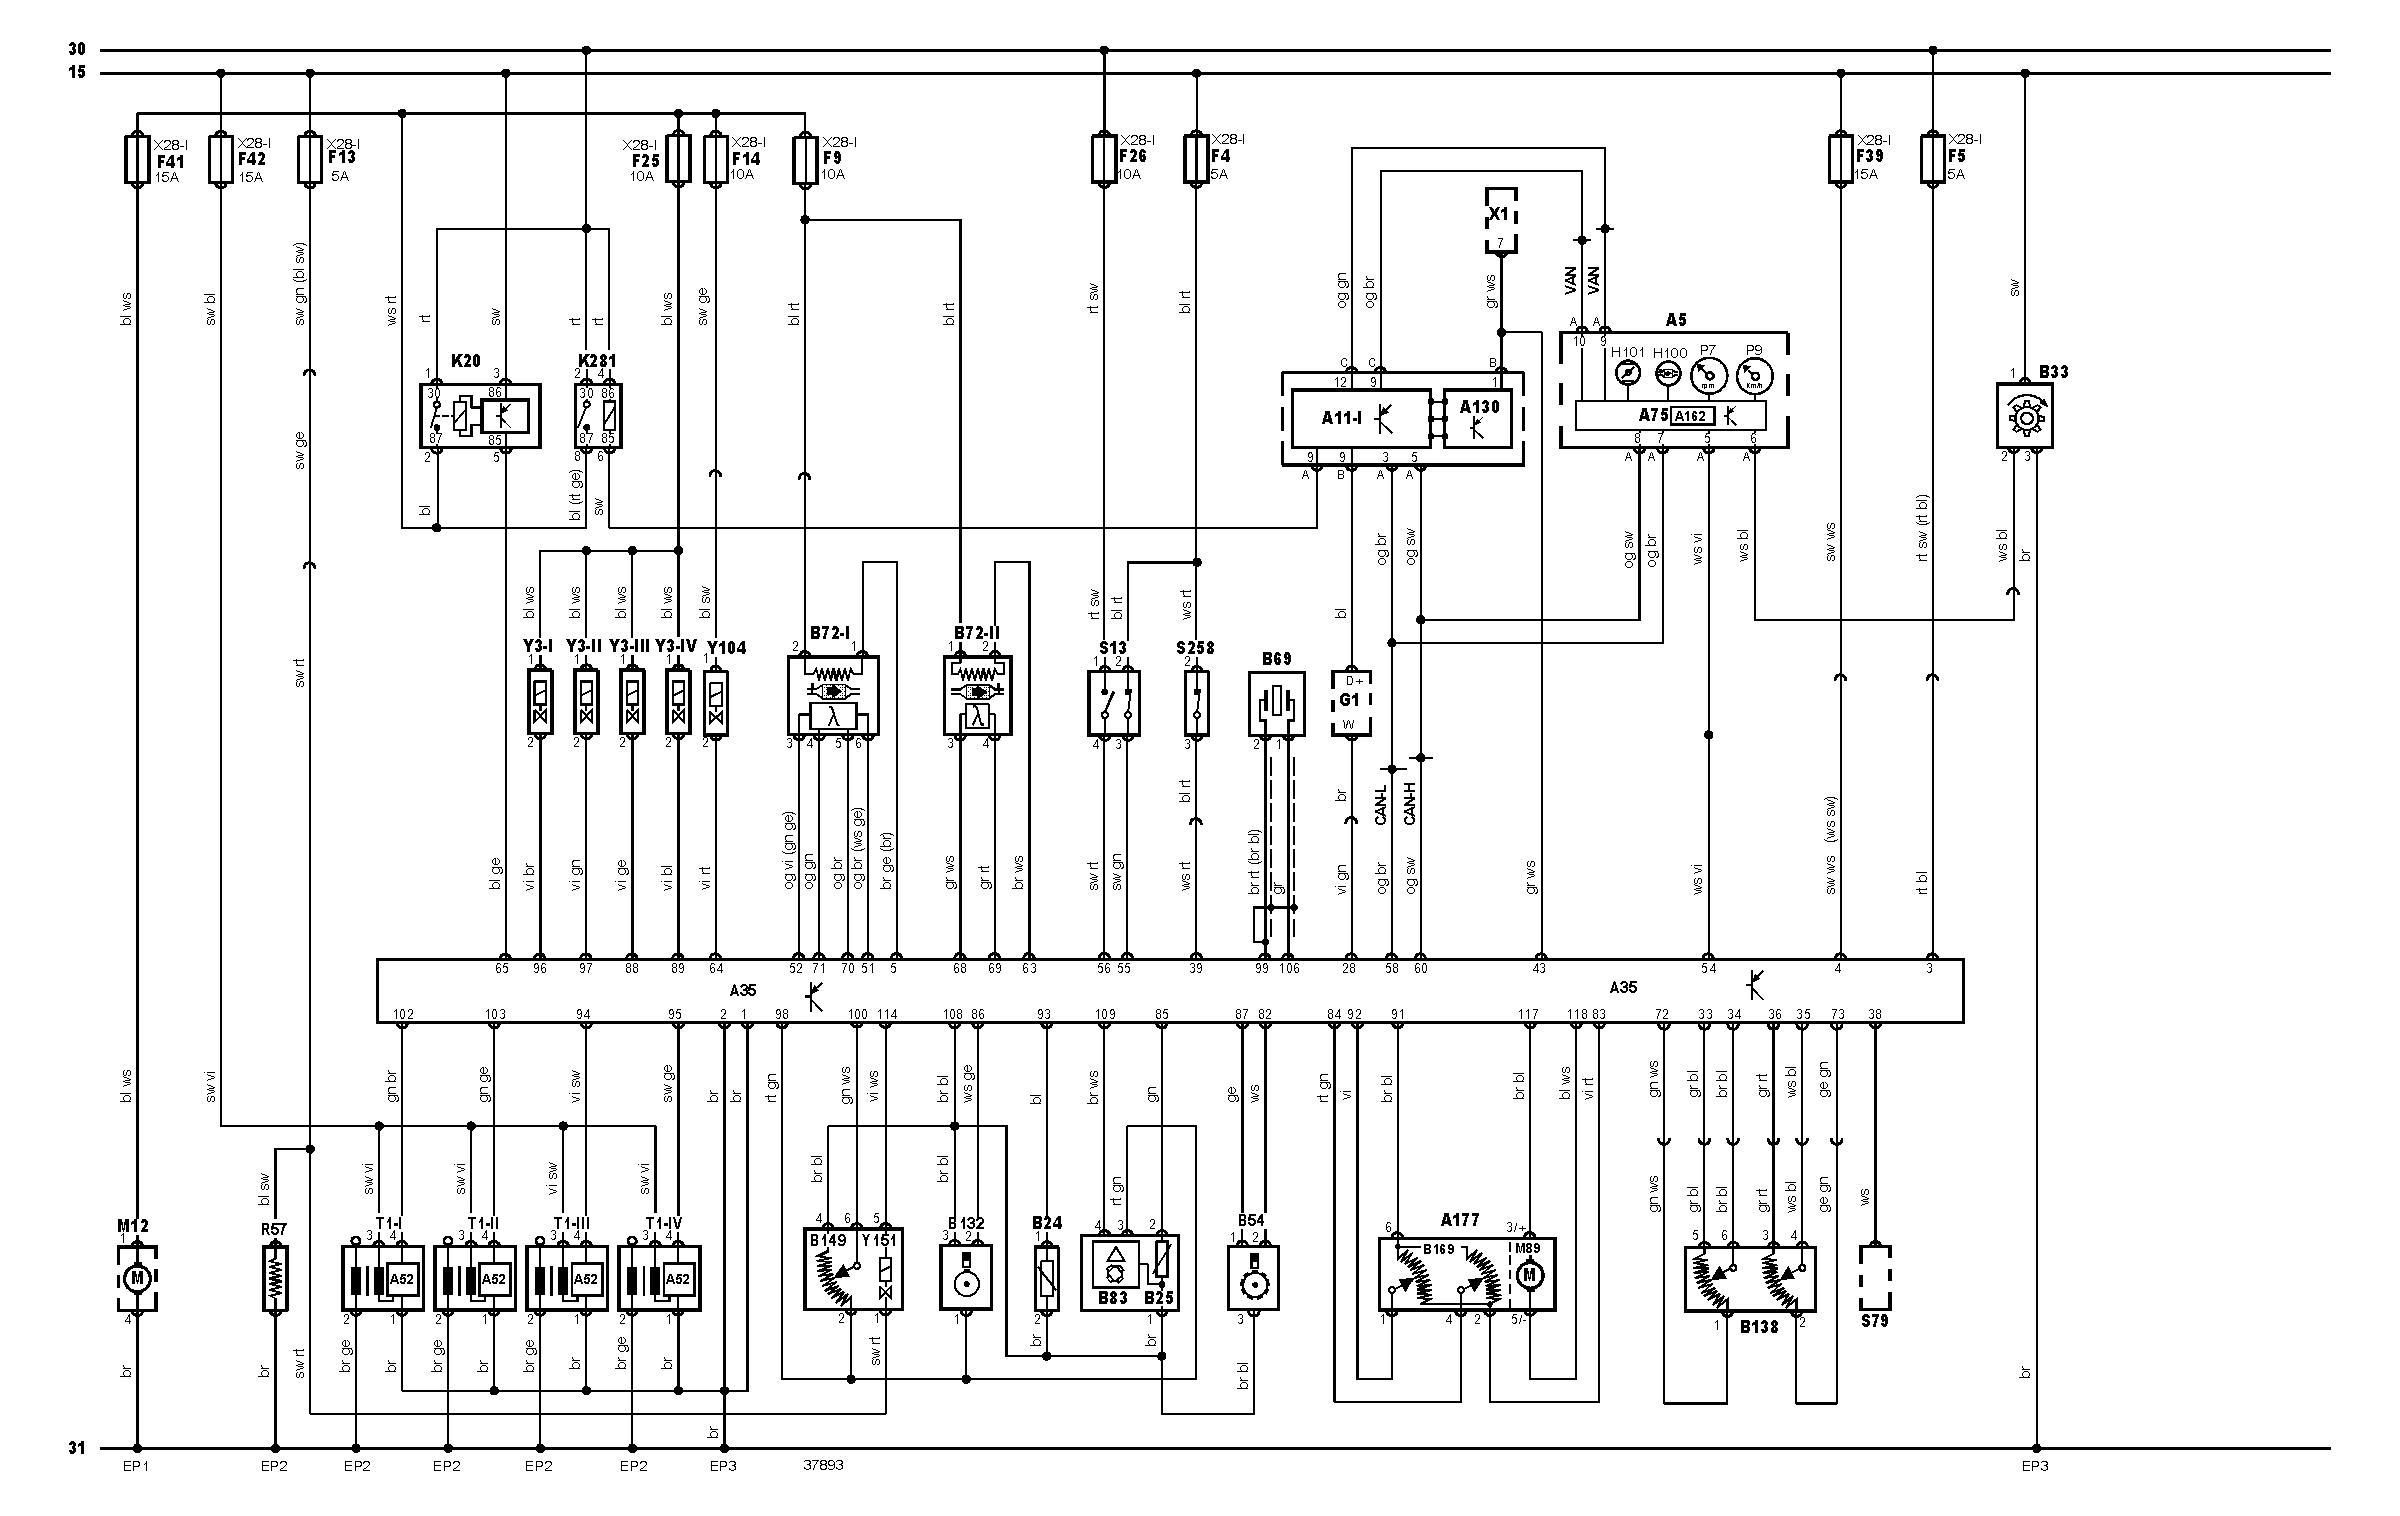 skoda fabia alternator wiring diagram skoda fabia alternator schaltplang - auto electrical ...